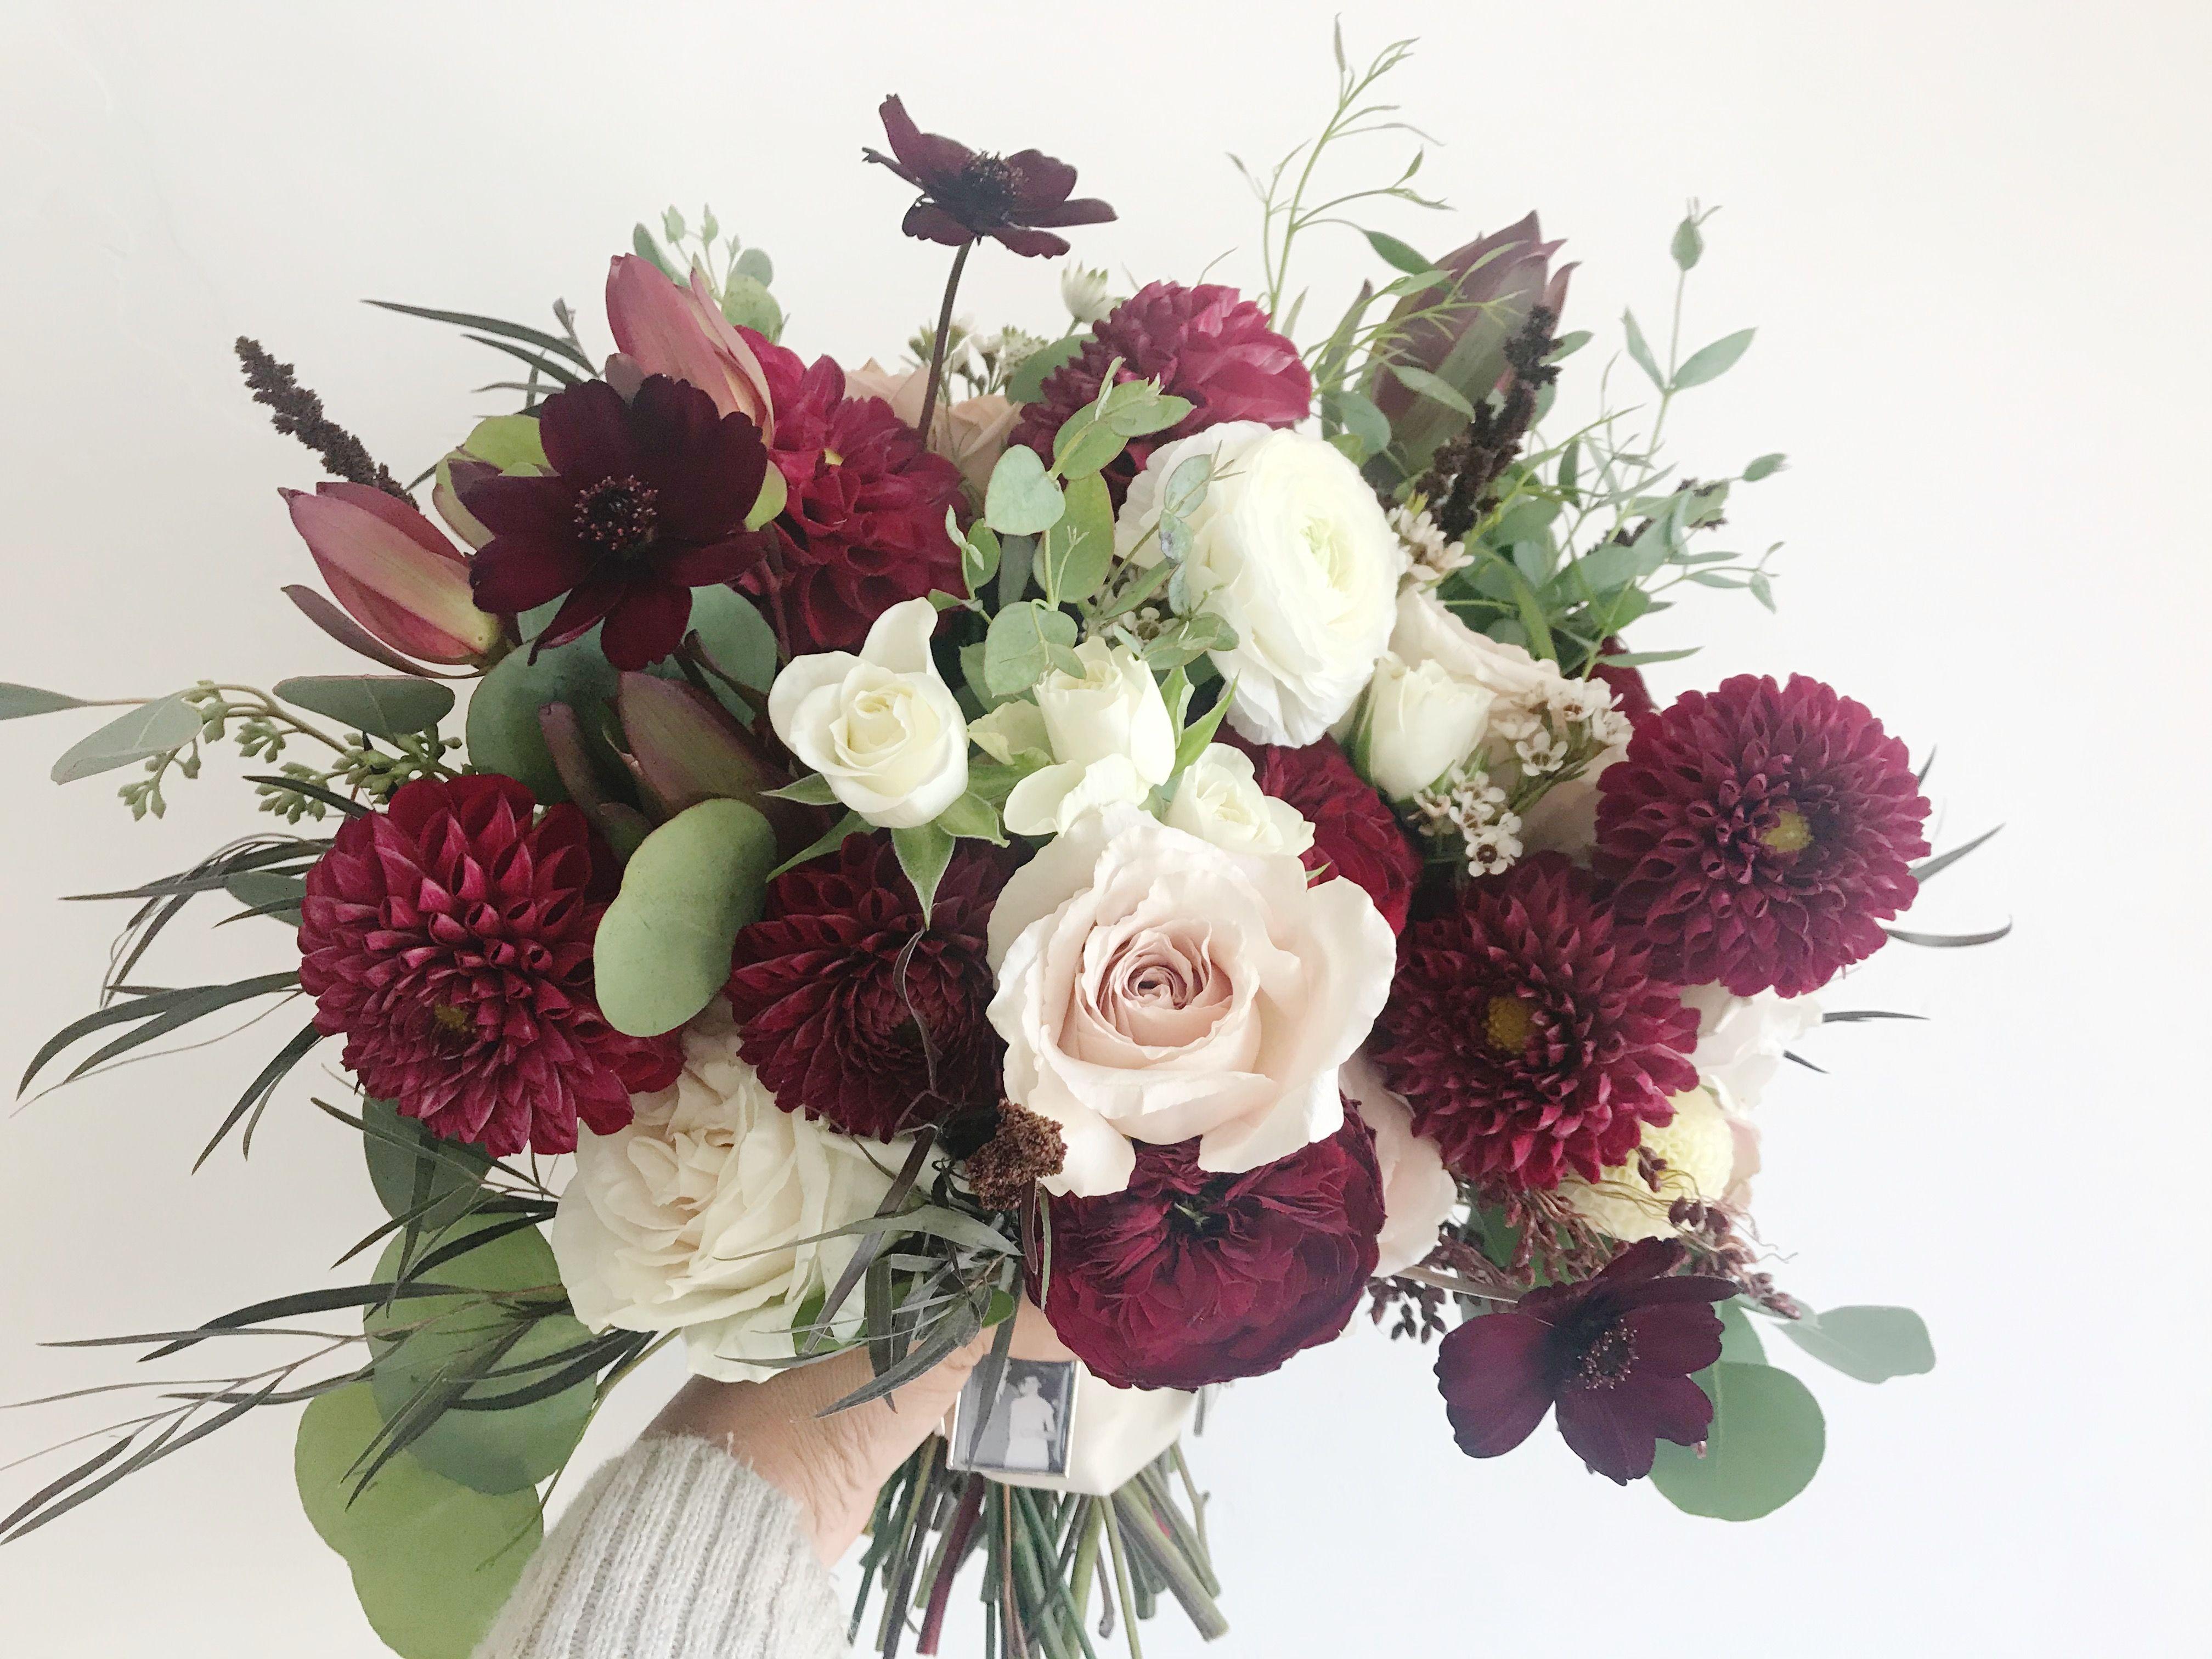 Rose Dahlia Chocolate Cosmos Ranunculus And Many Other Seasonal Bloom Romantic Bouque Beautiful Wedding Flowers Dahlia Wedding Bouquets Diy Wedding Flowers